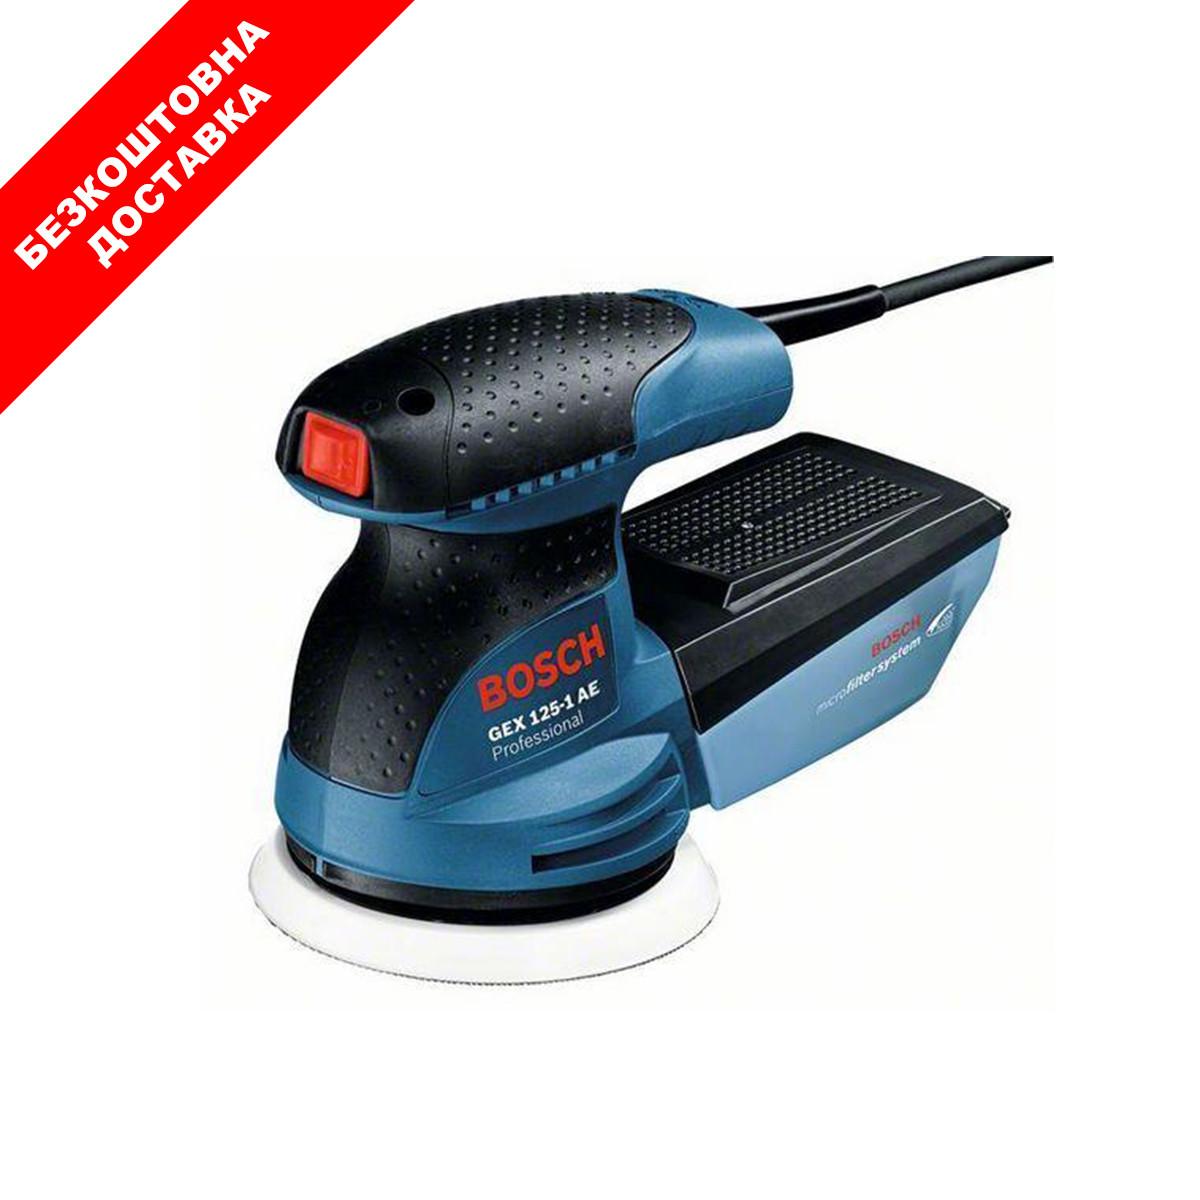 Вібраційна шліфмашина Bosch GEX 125-1 AE (0601387501)